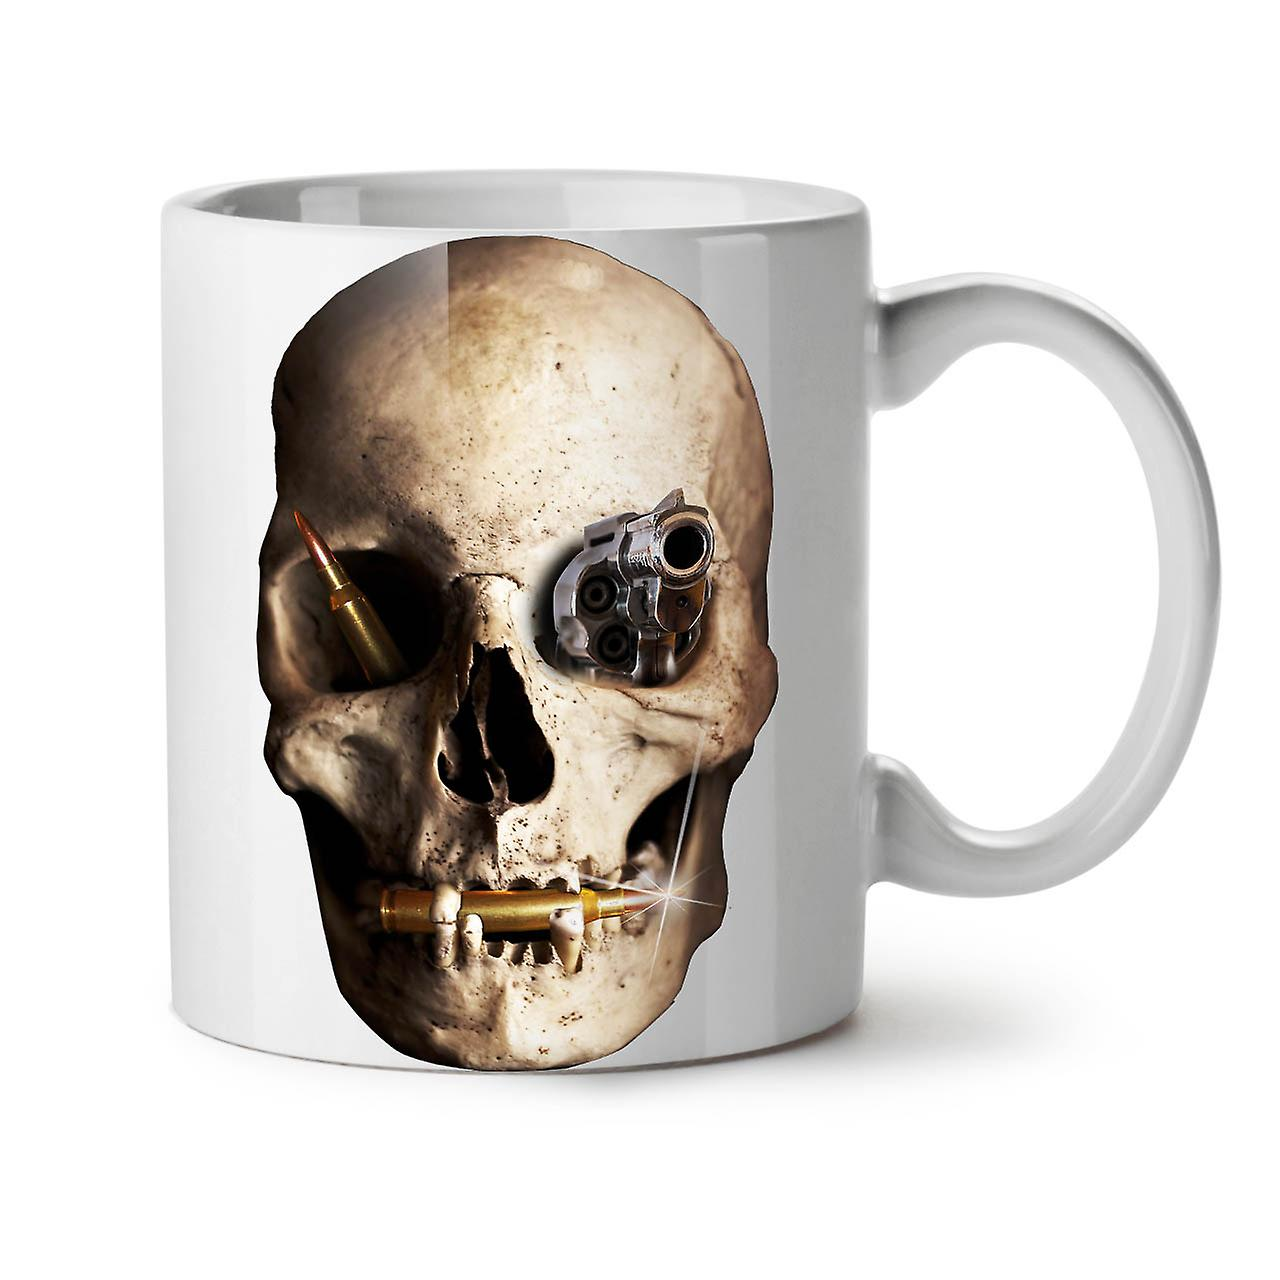 Skull Café Metal Gun Thé OzWellcoda Death Nouveau Céramique Tasse 11 Blanc dxreWoCB